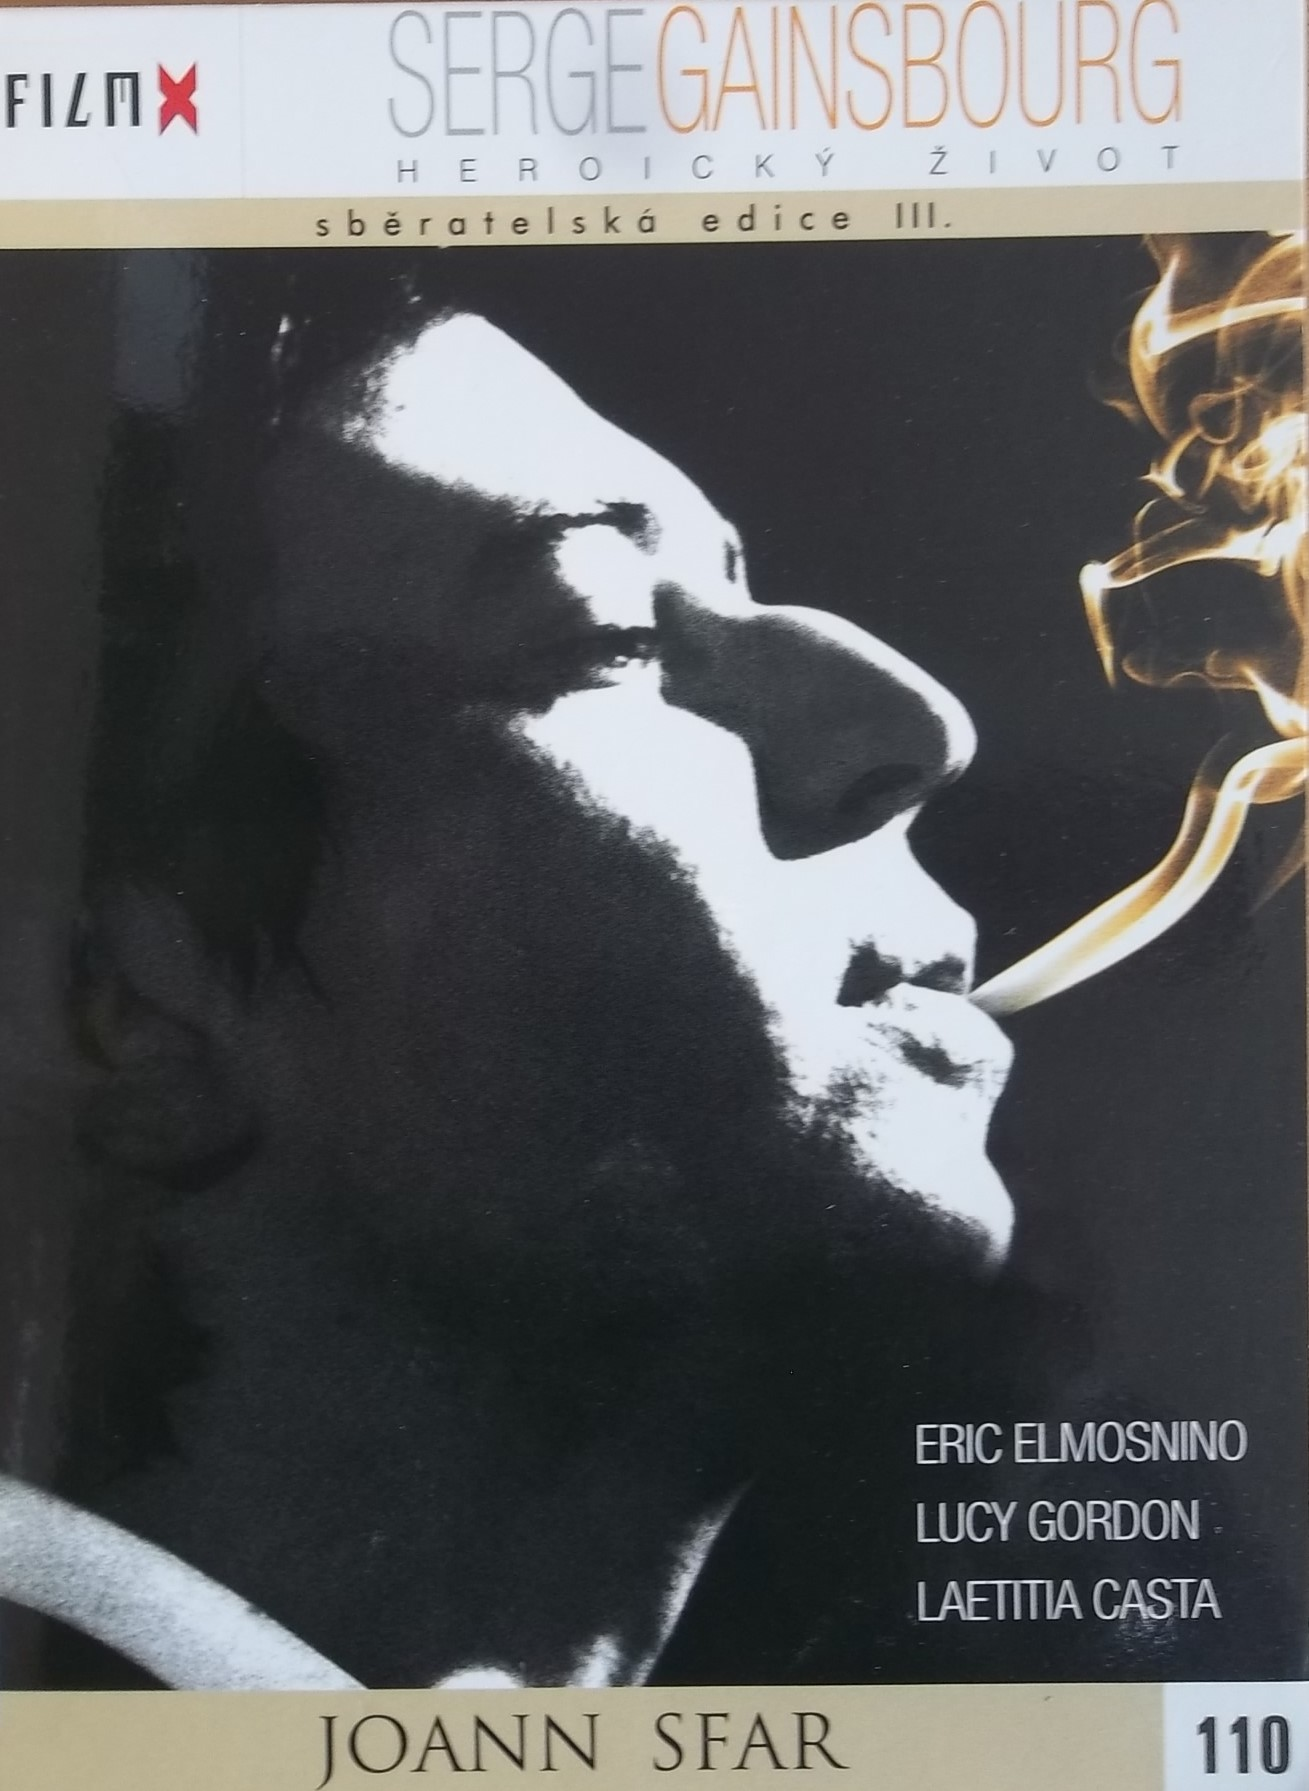 Serge gainsbourg: Heroický život - DVD